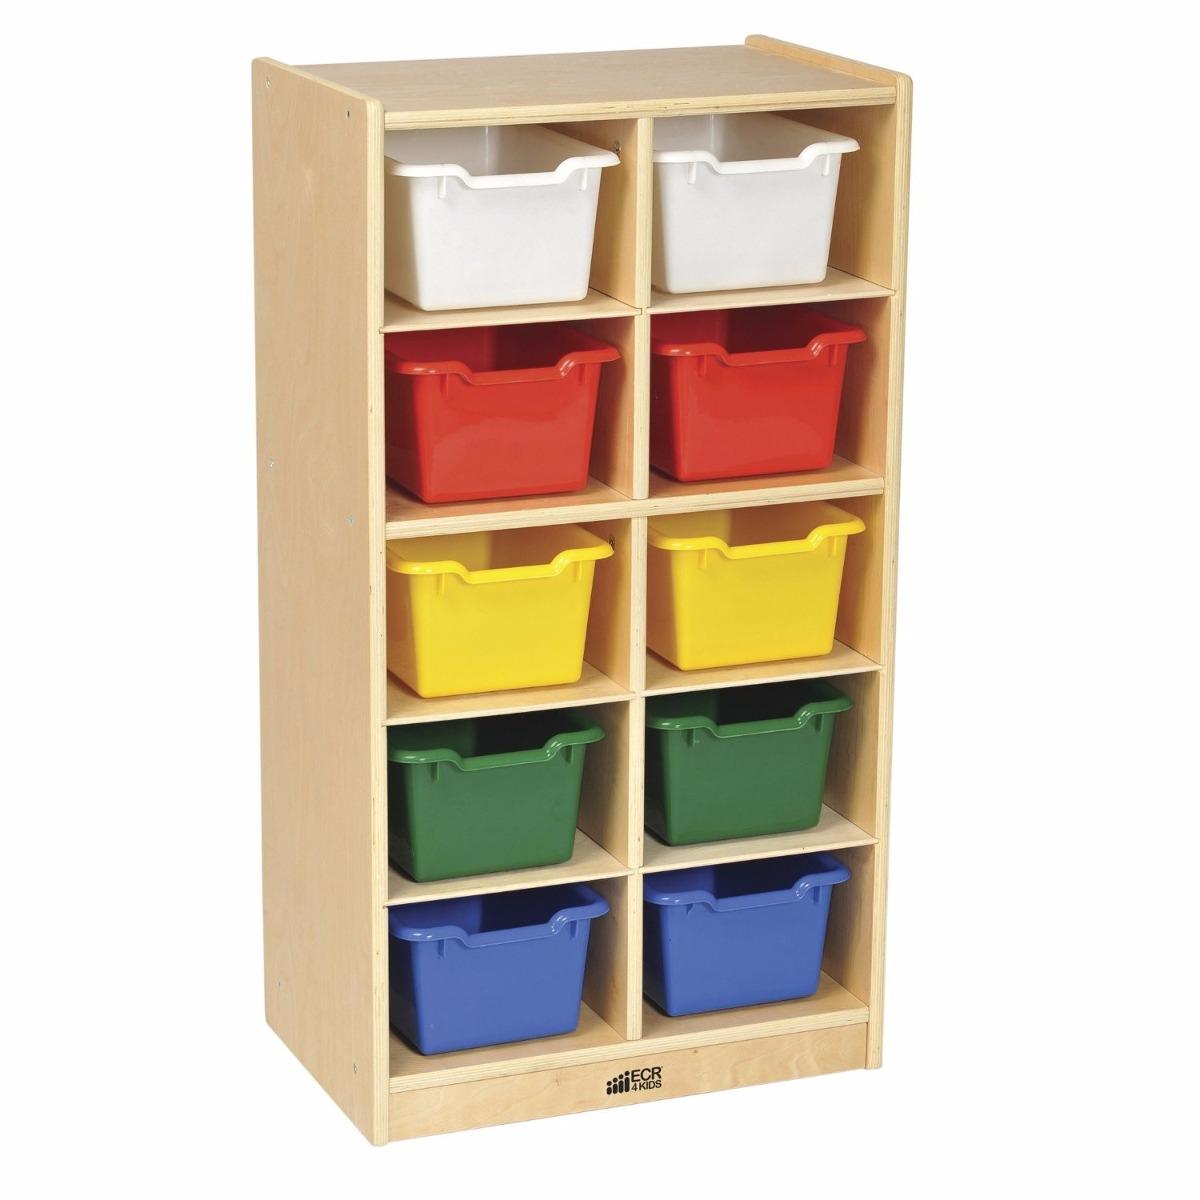 Organizador para guardar juguetes gabinete estante para - Estantes para juguetes ...